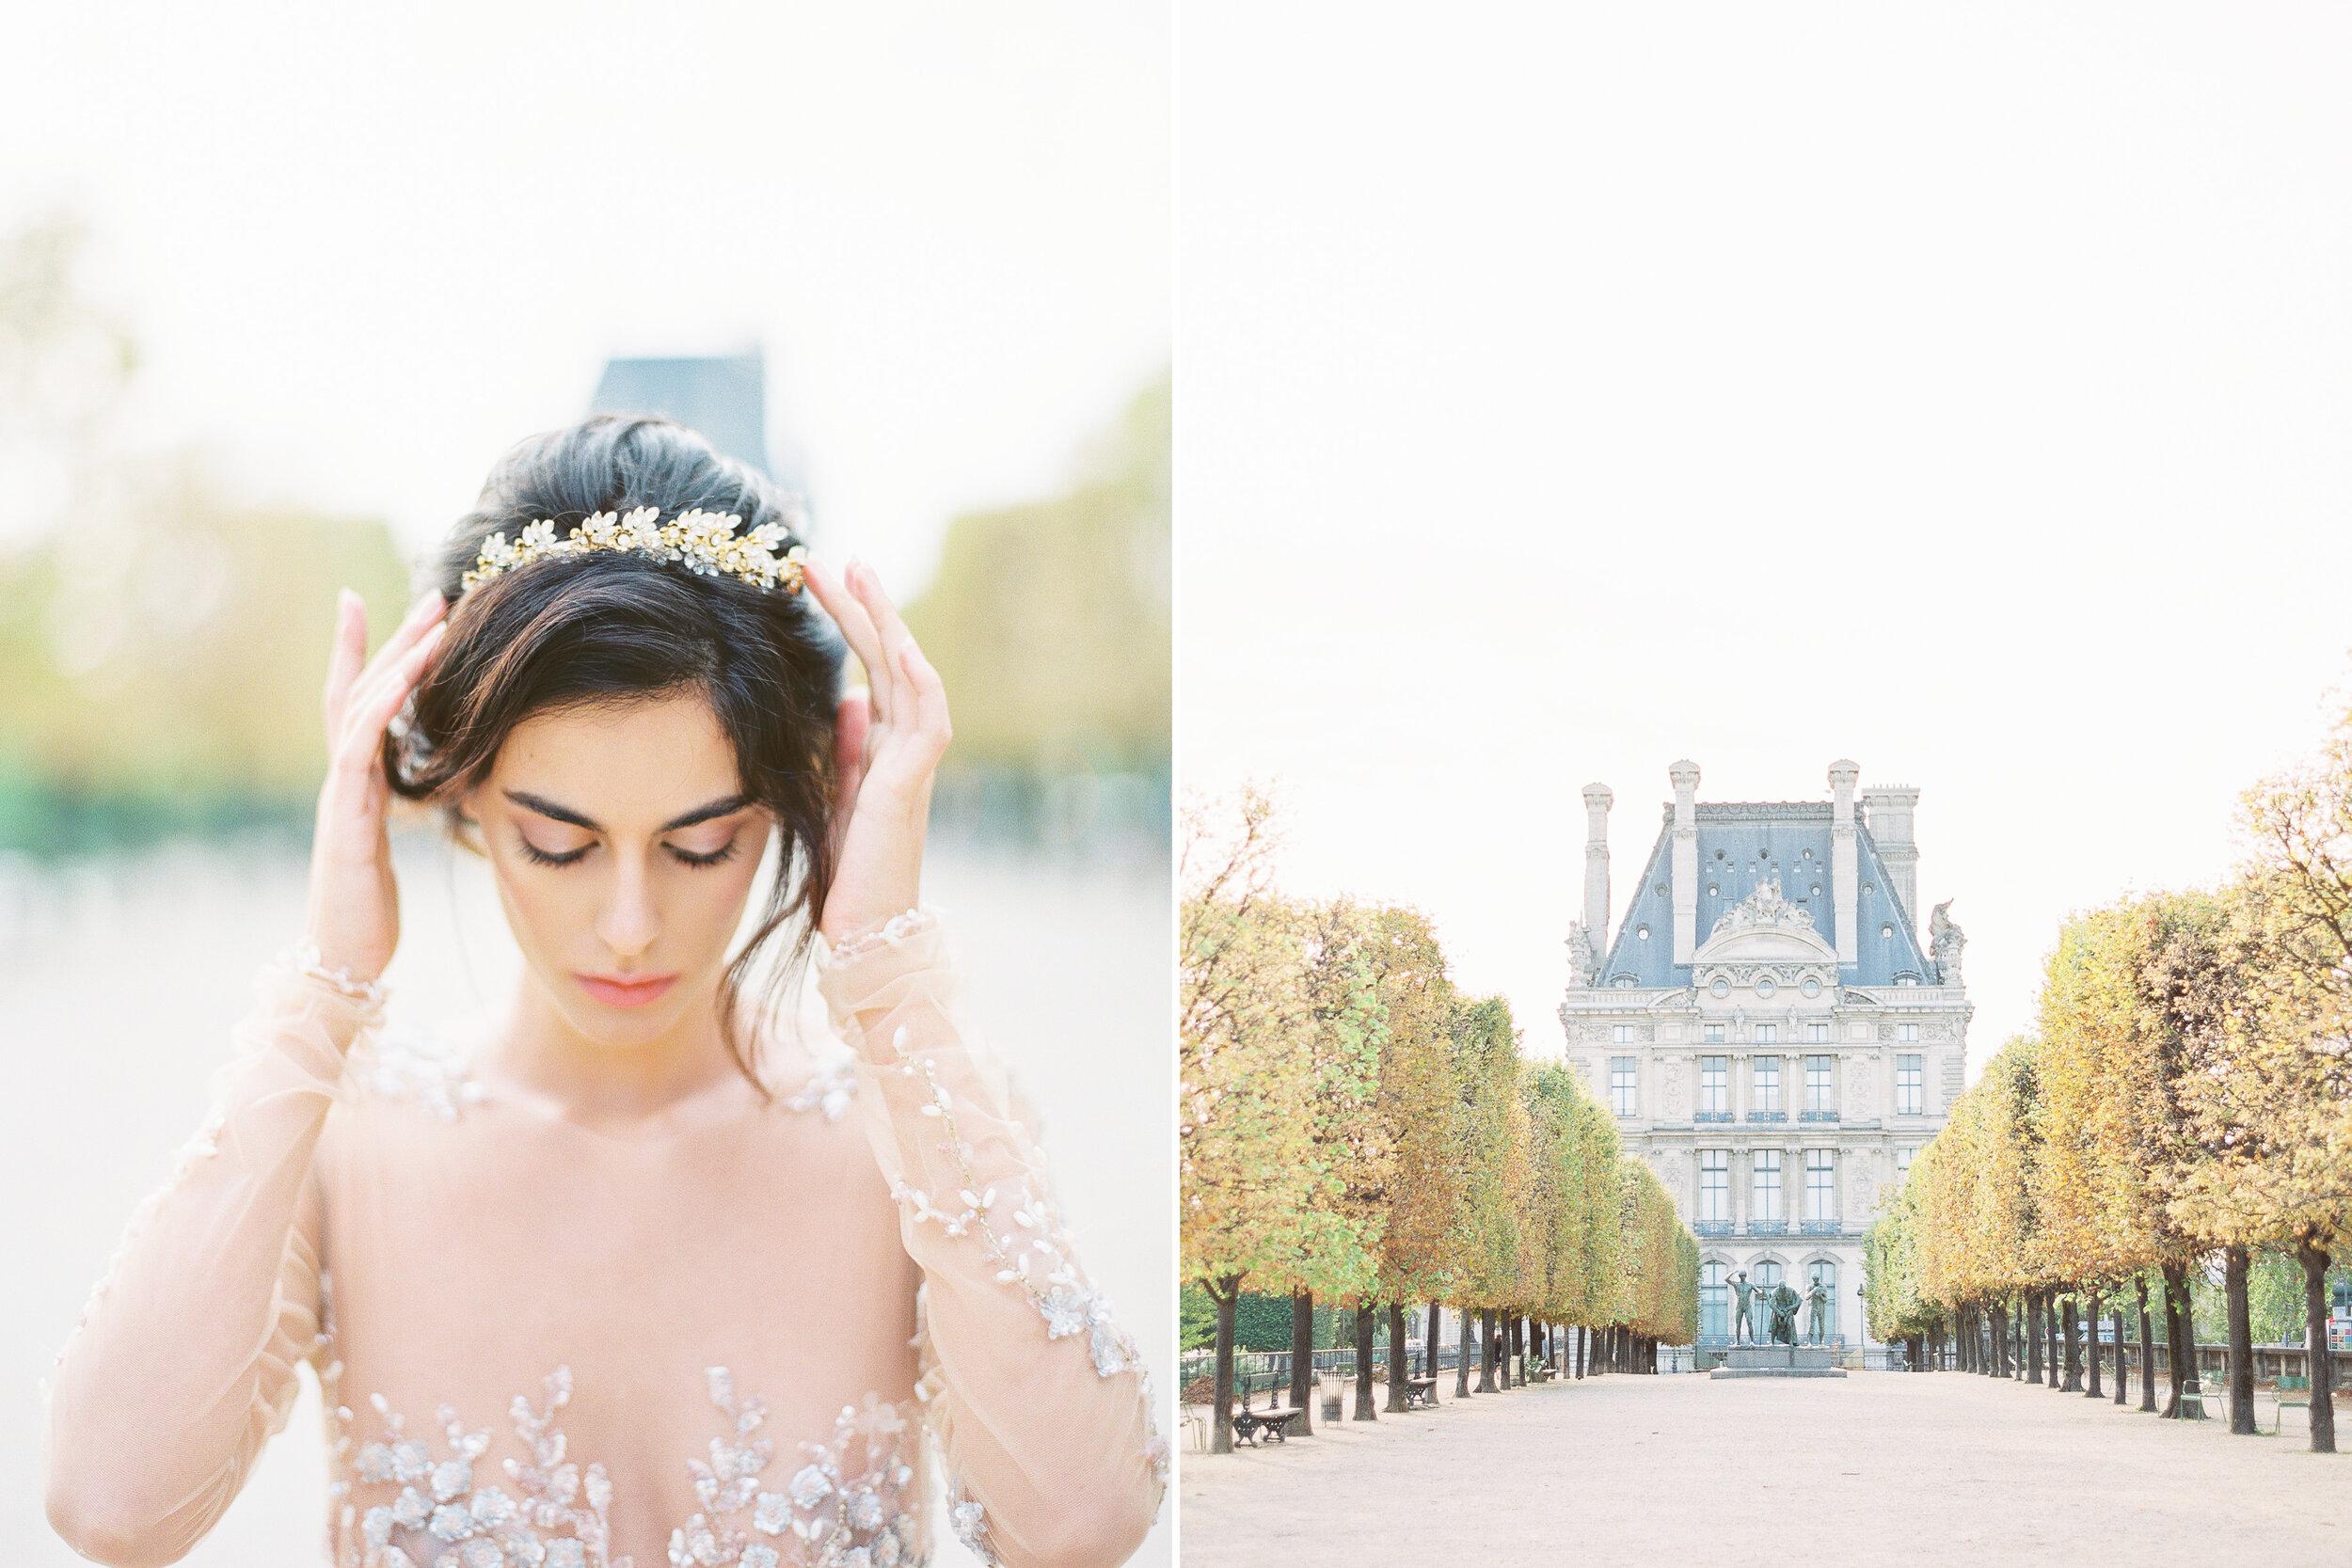 RachelOwensPhotography - ParisWeddingInspiration - 1.jpg